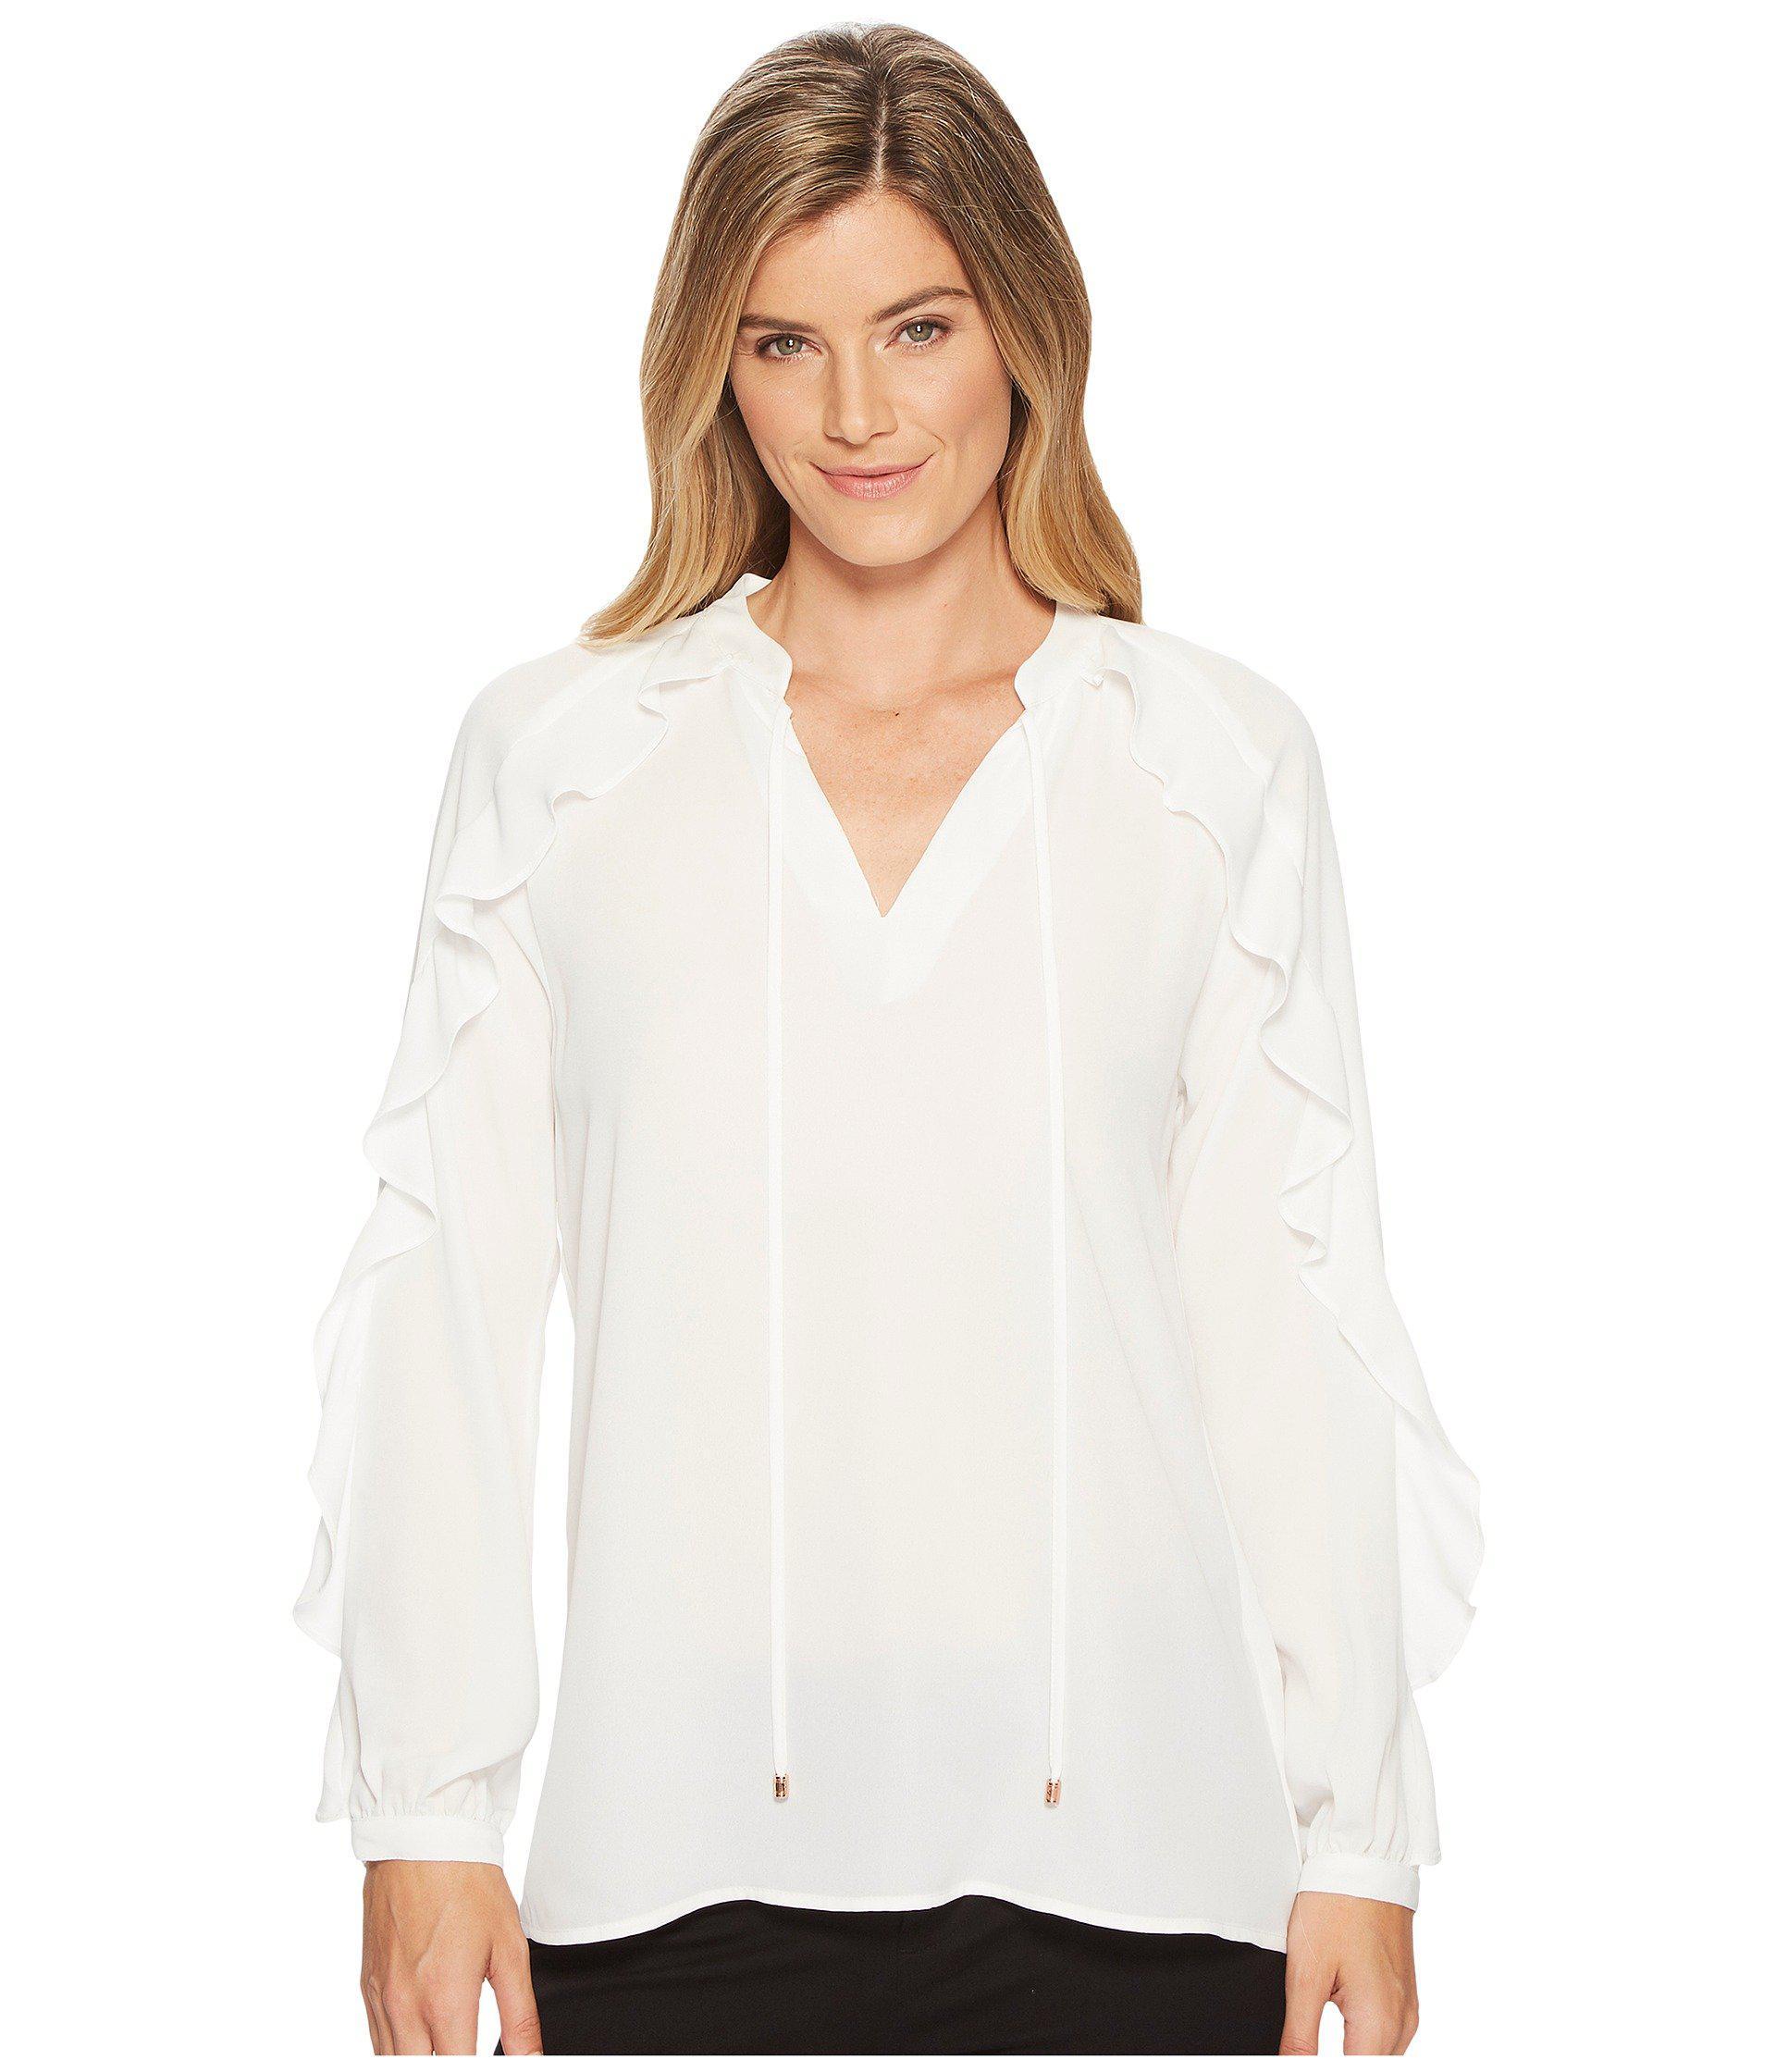 453f2a0ba6c314 Lyst - Ivanka Trump Georgette Long Sleeve Ruffle Blouse in White